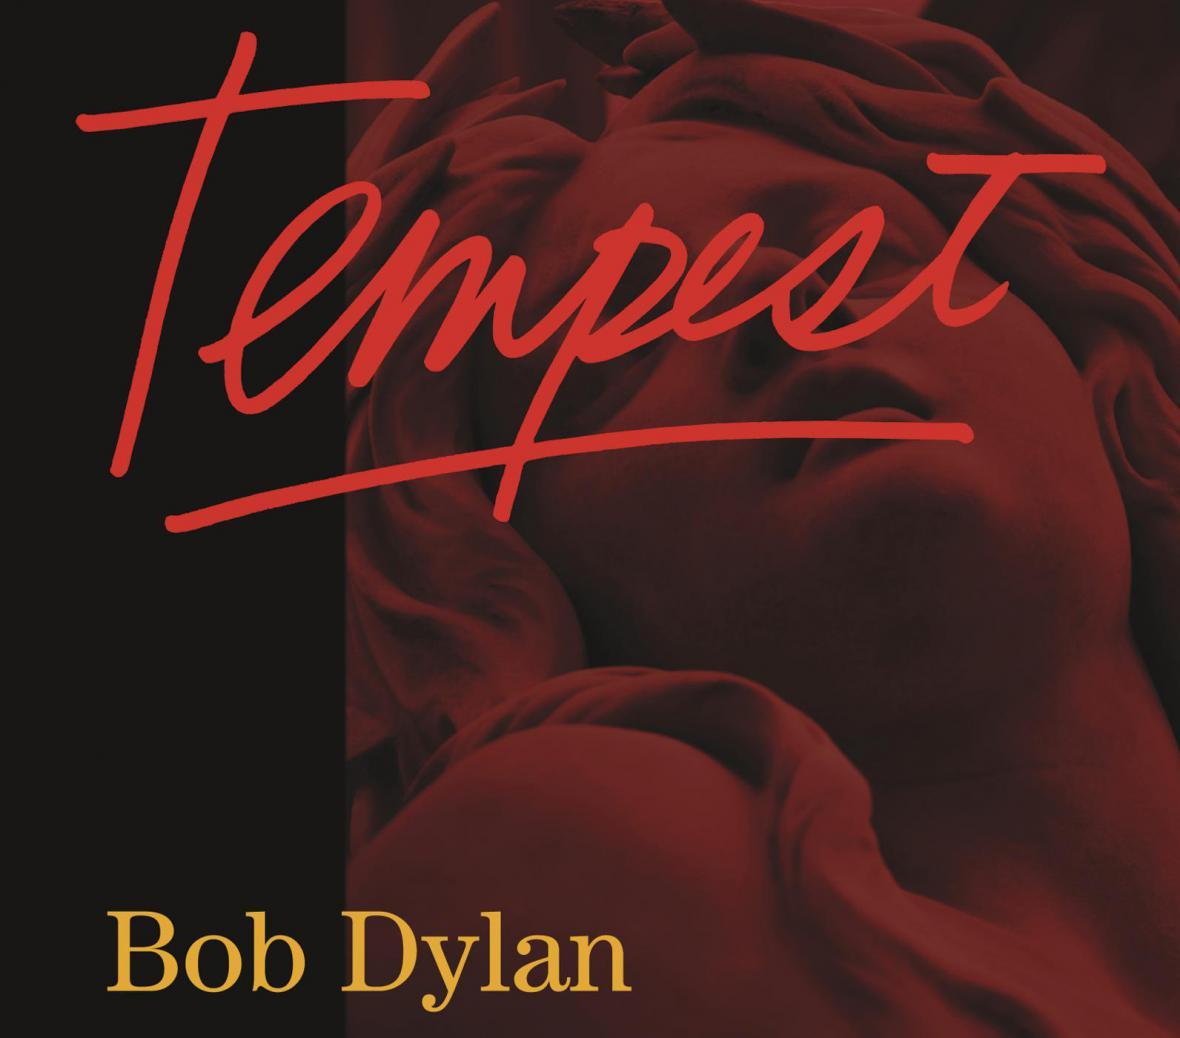 Bob Dylan / Tempest